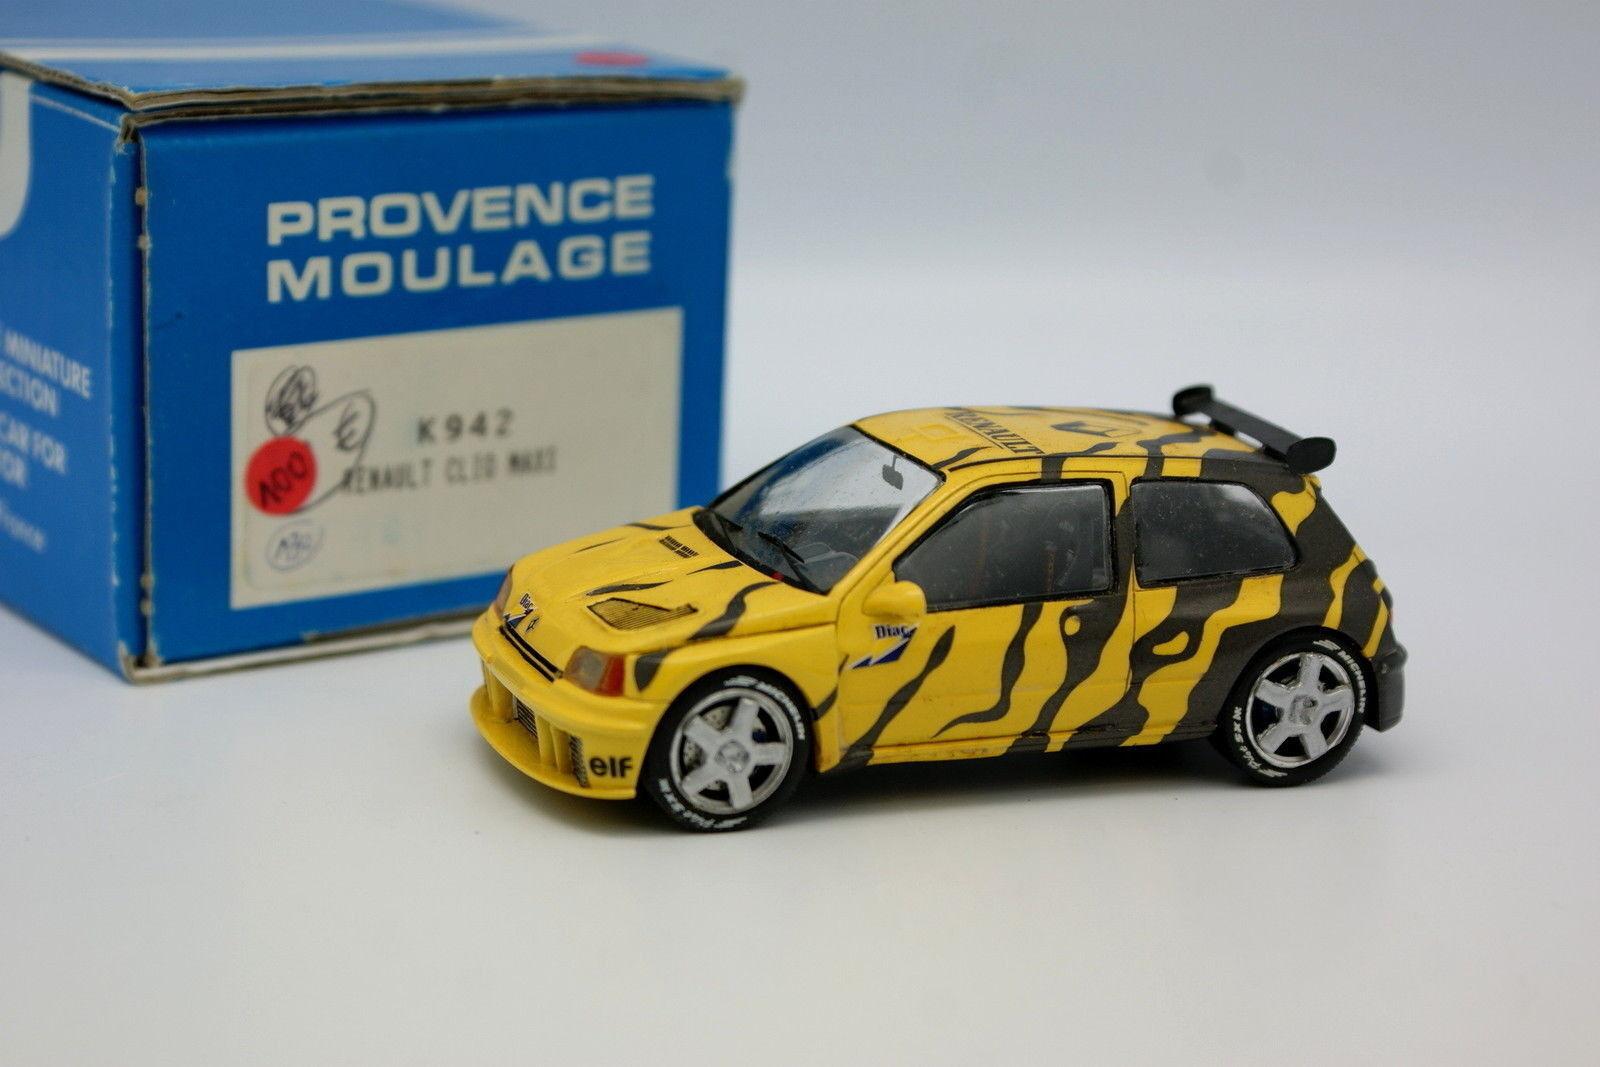 Provence Moulage 1 43 - Renault Clio Maxi Presentation